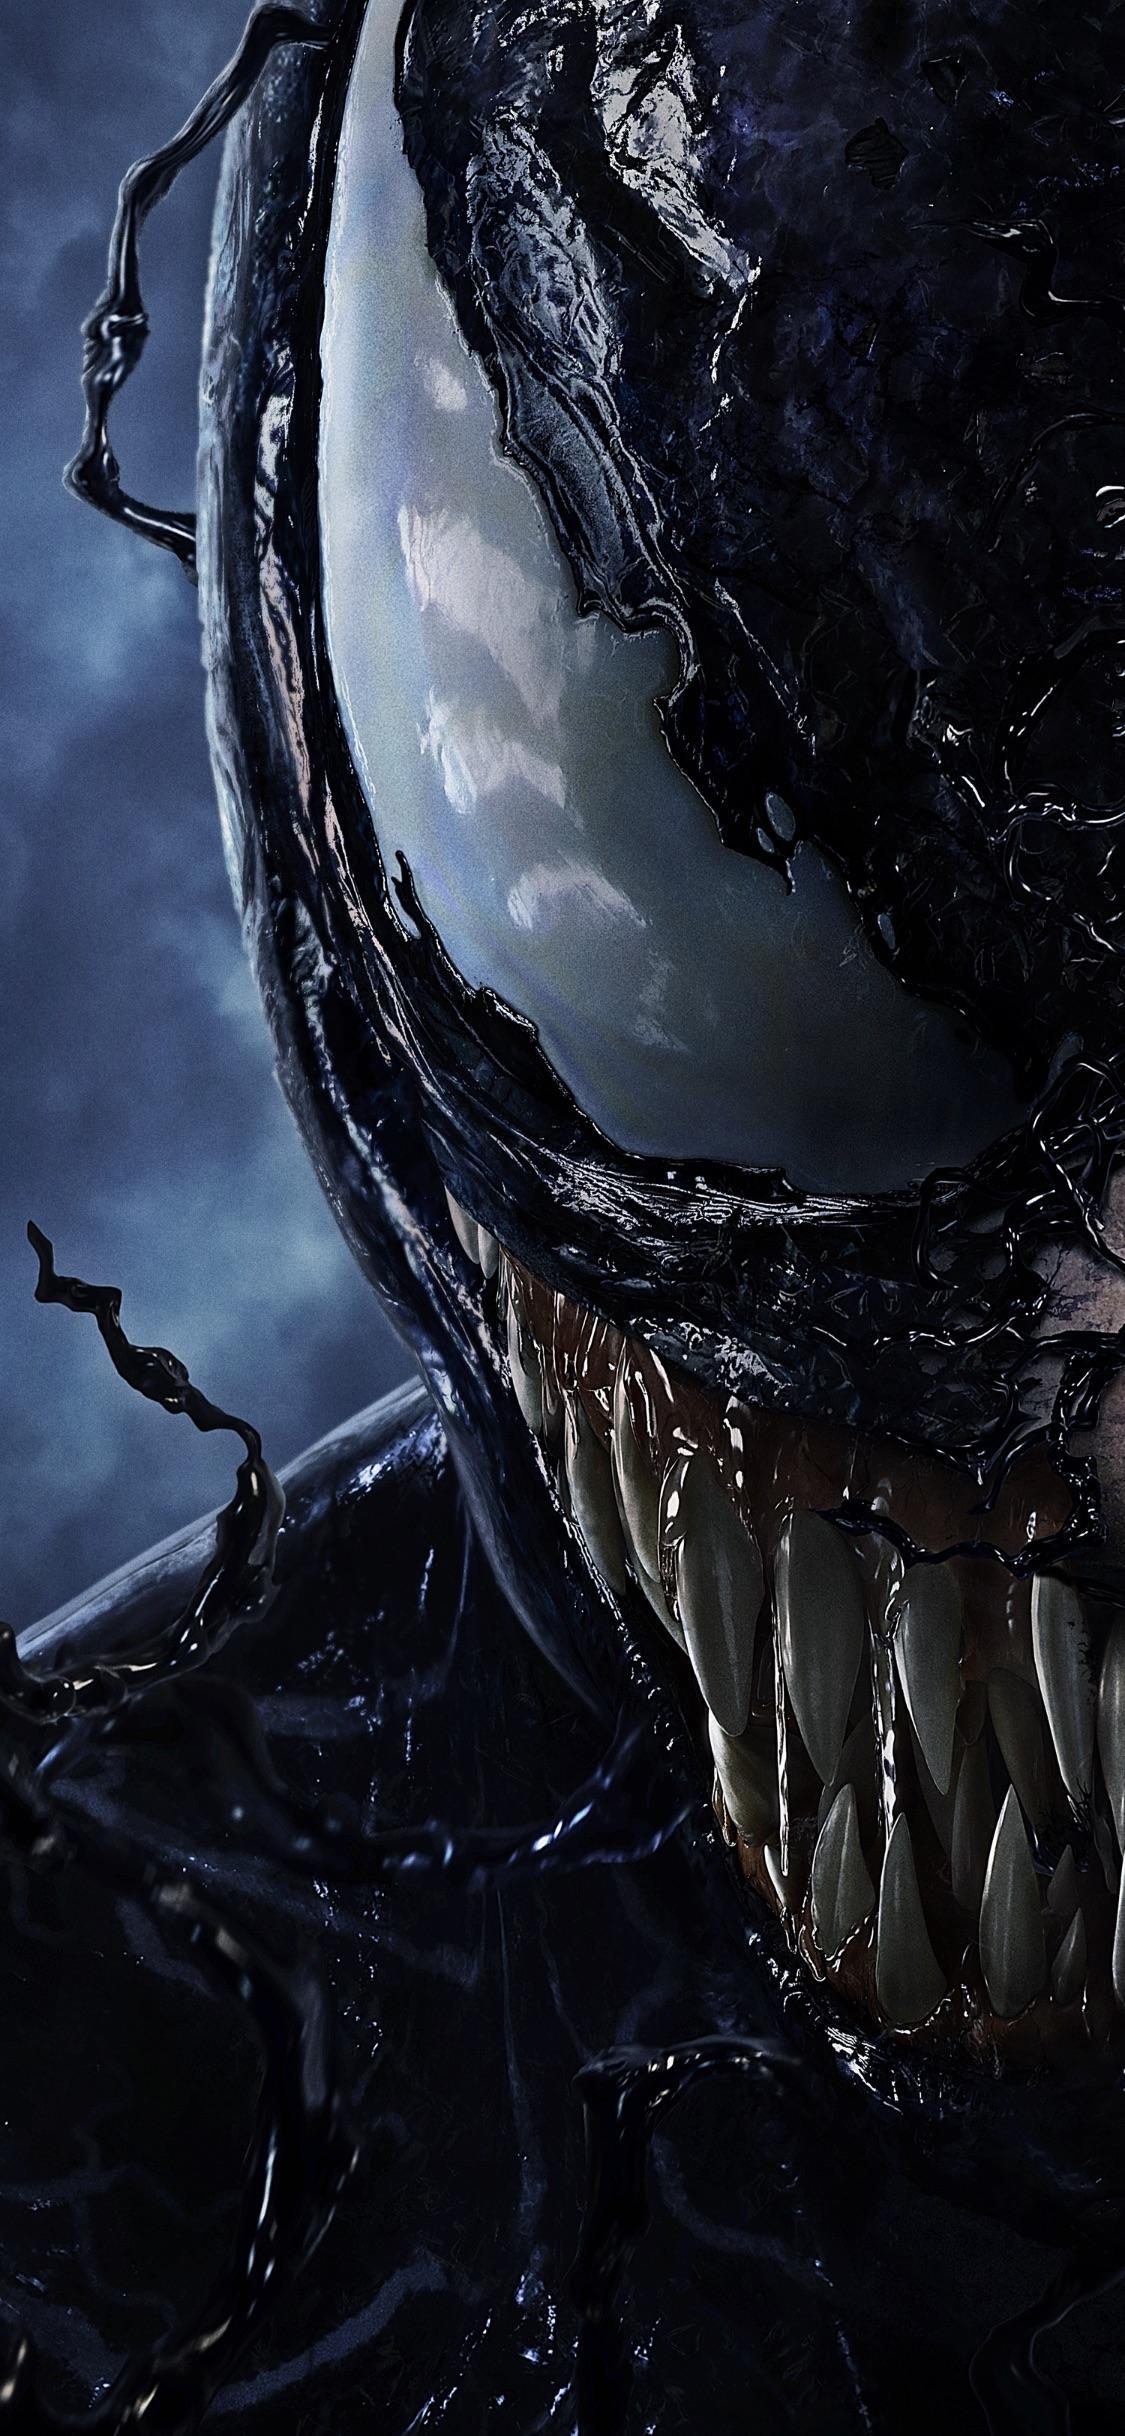 Venom iPhone X Wallpapers   Top Venom iPhone X Backgrounds 1125x2436